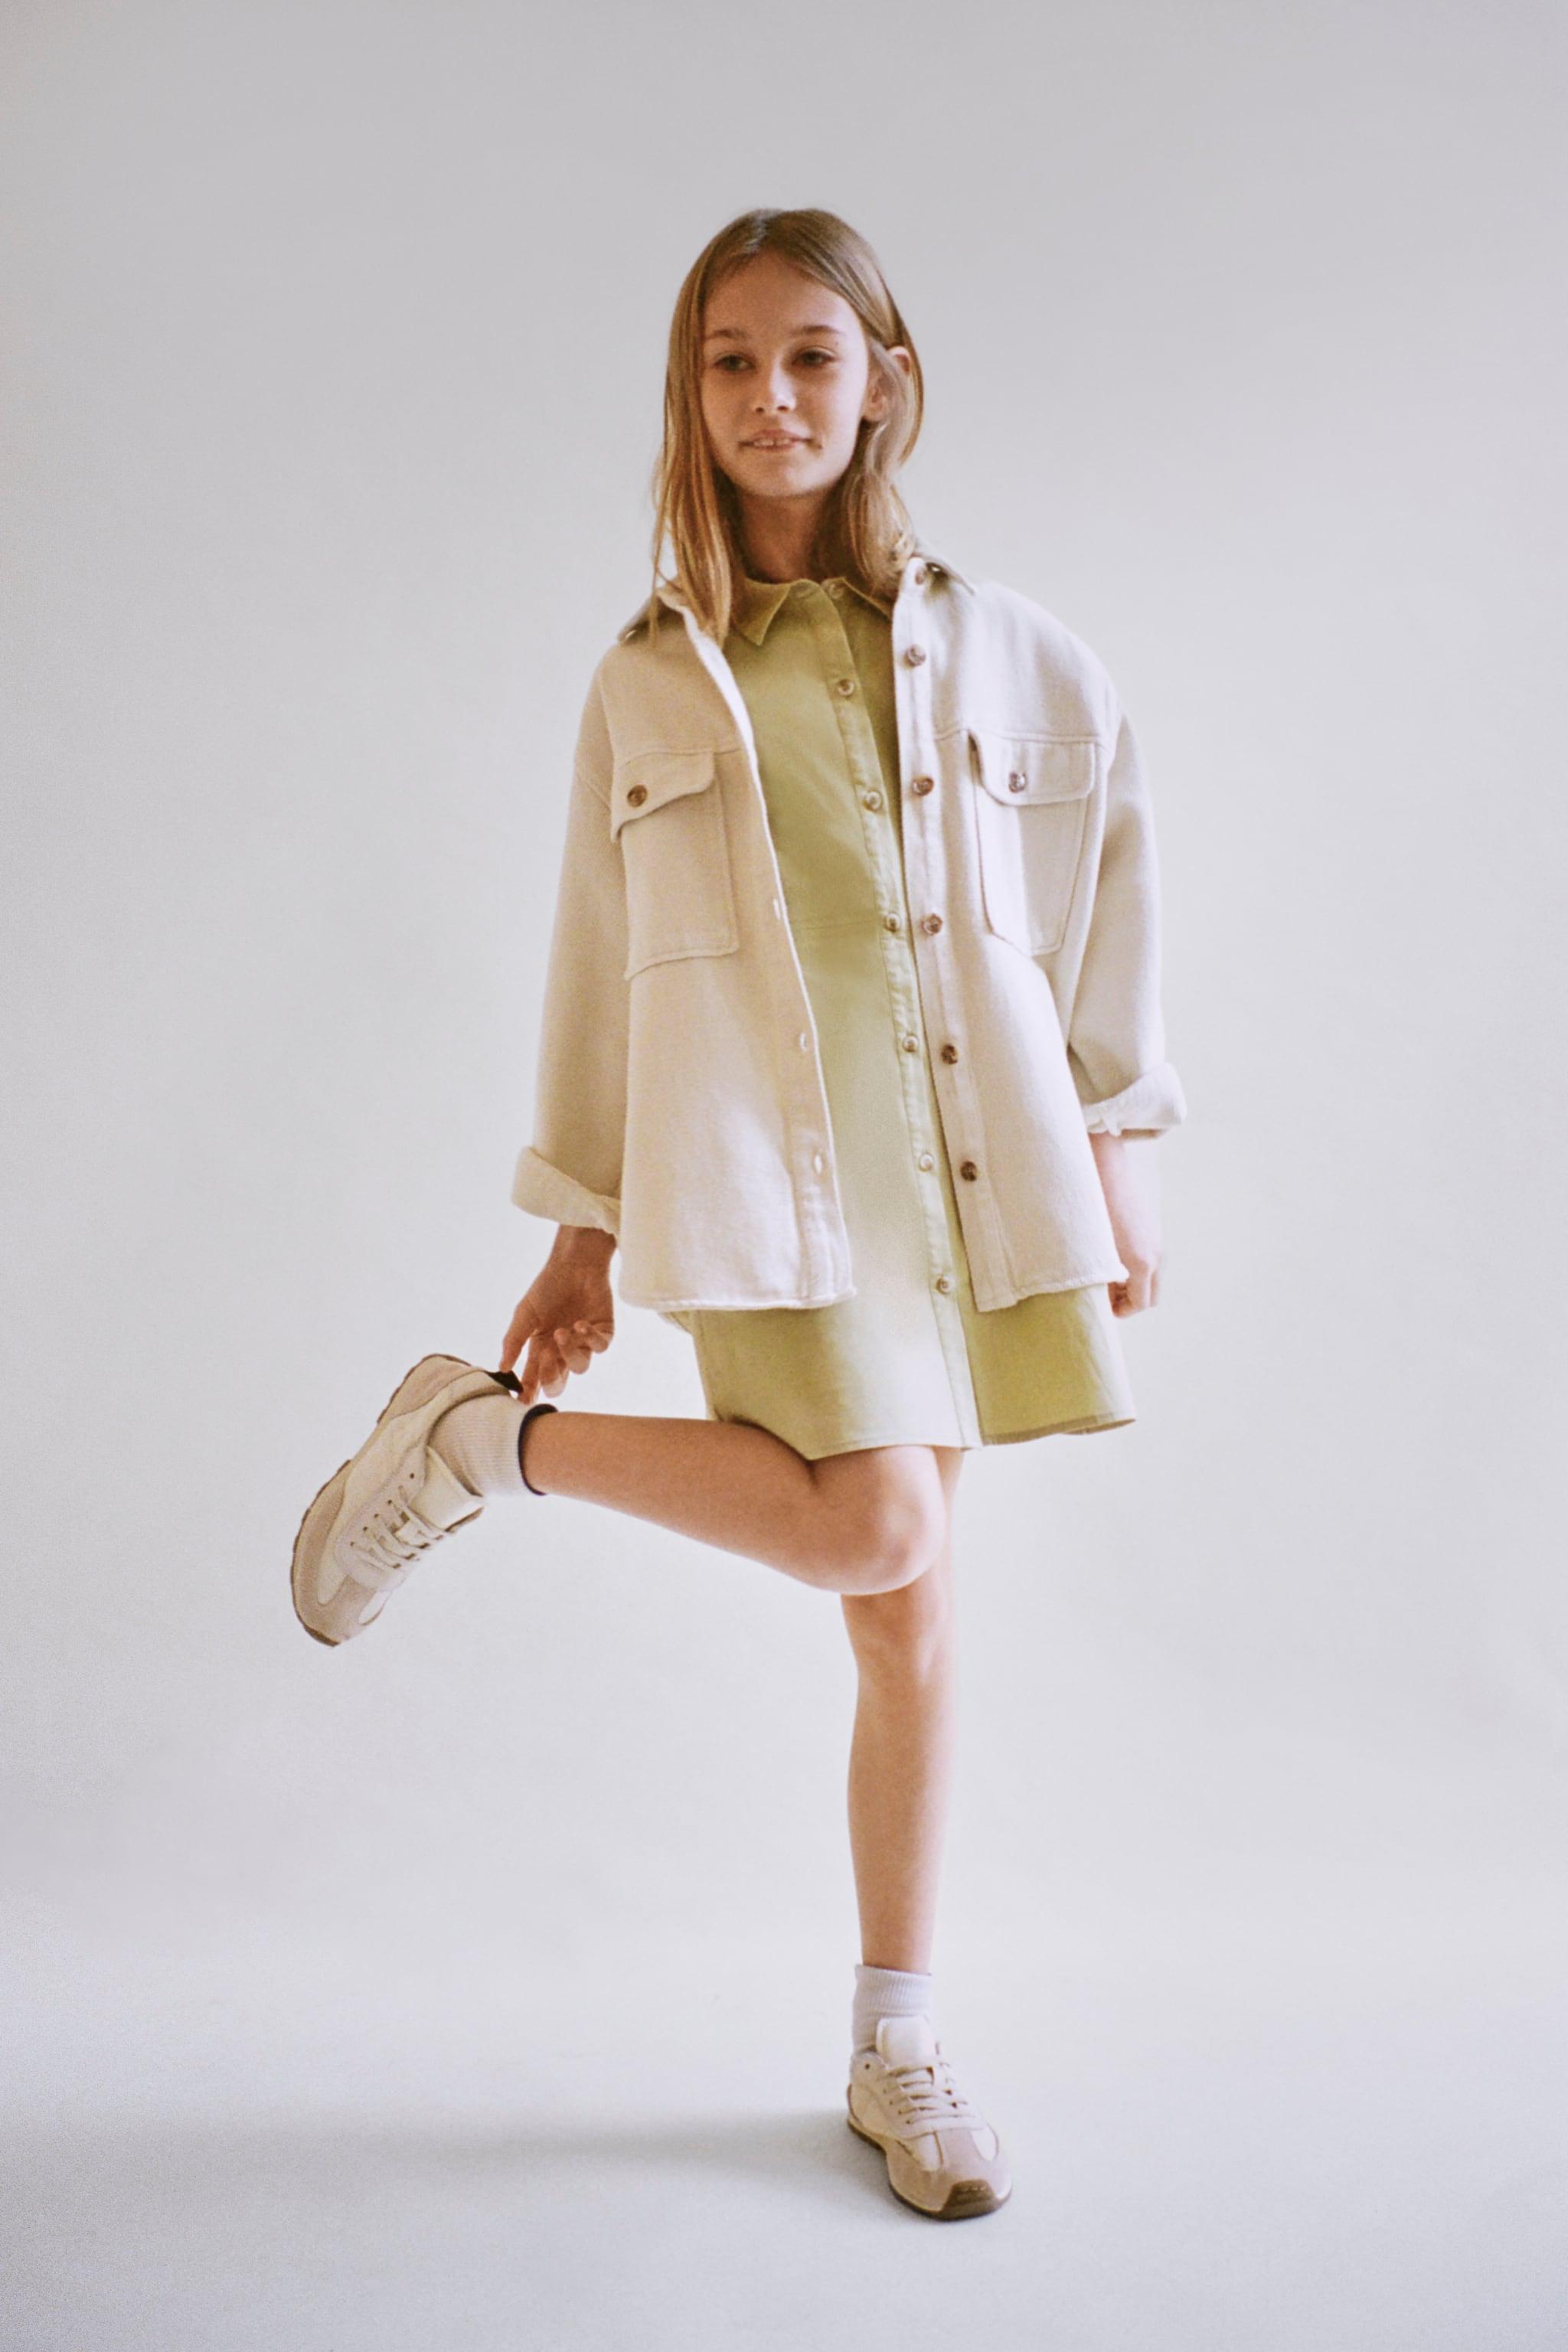 Zara COMBINATION SOFT SNEAKERS